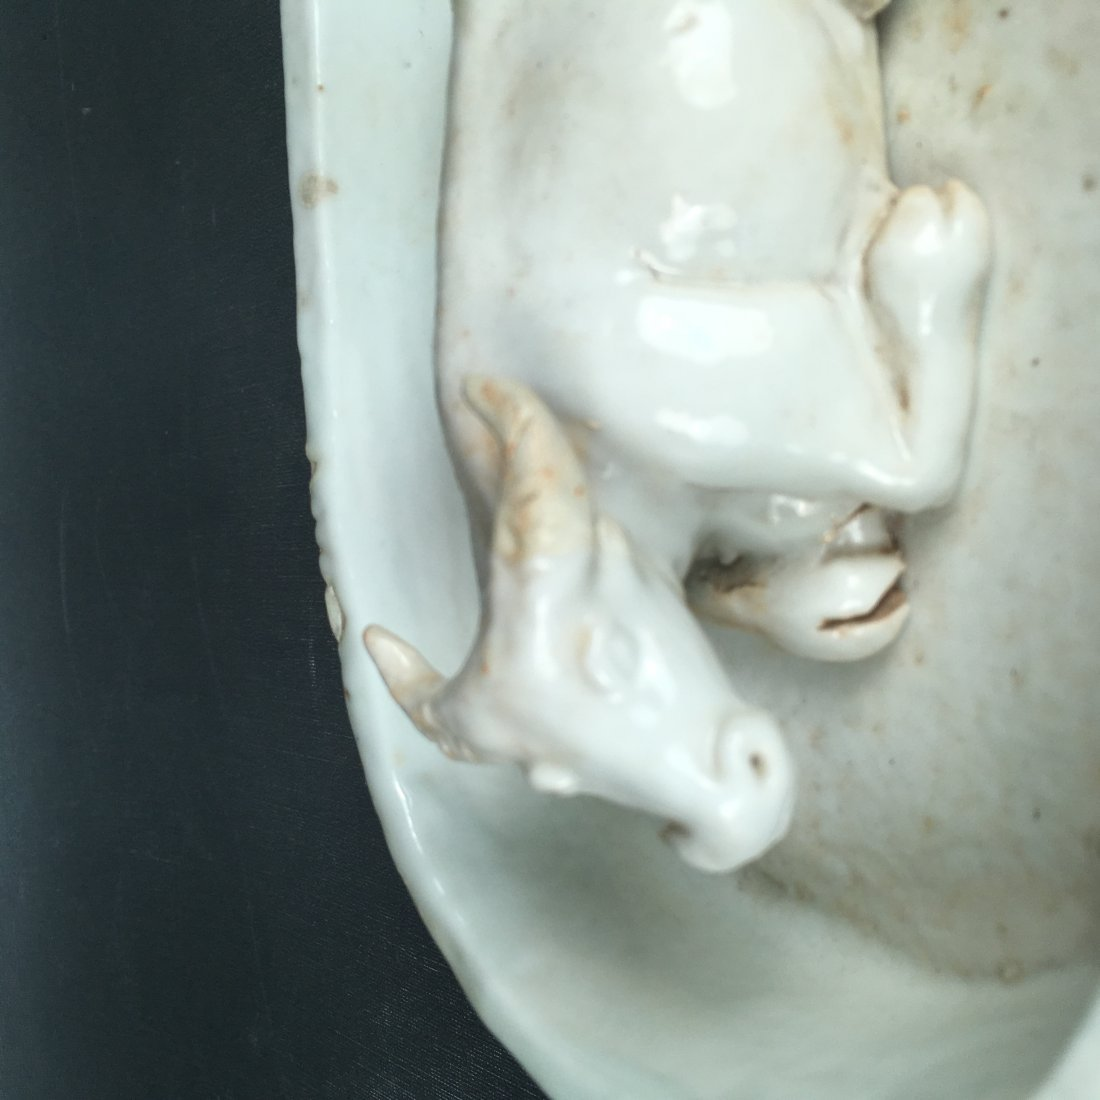 CHINESE WHITE GLAZE COUGHING BULL BRISH WASHER - 2